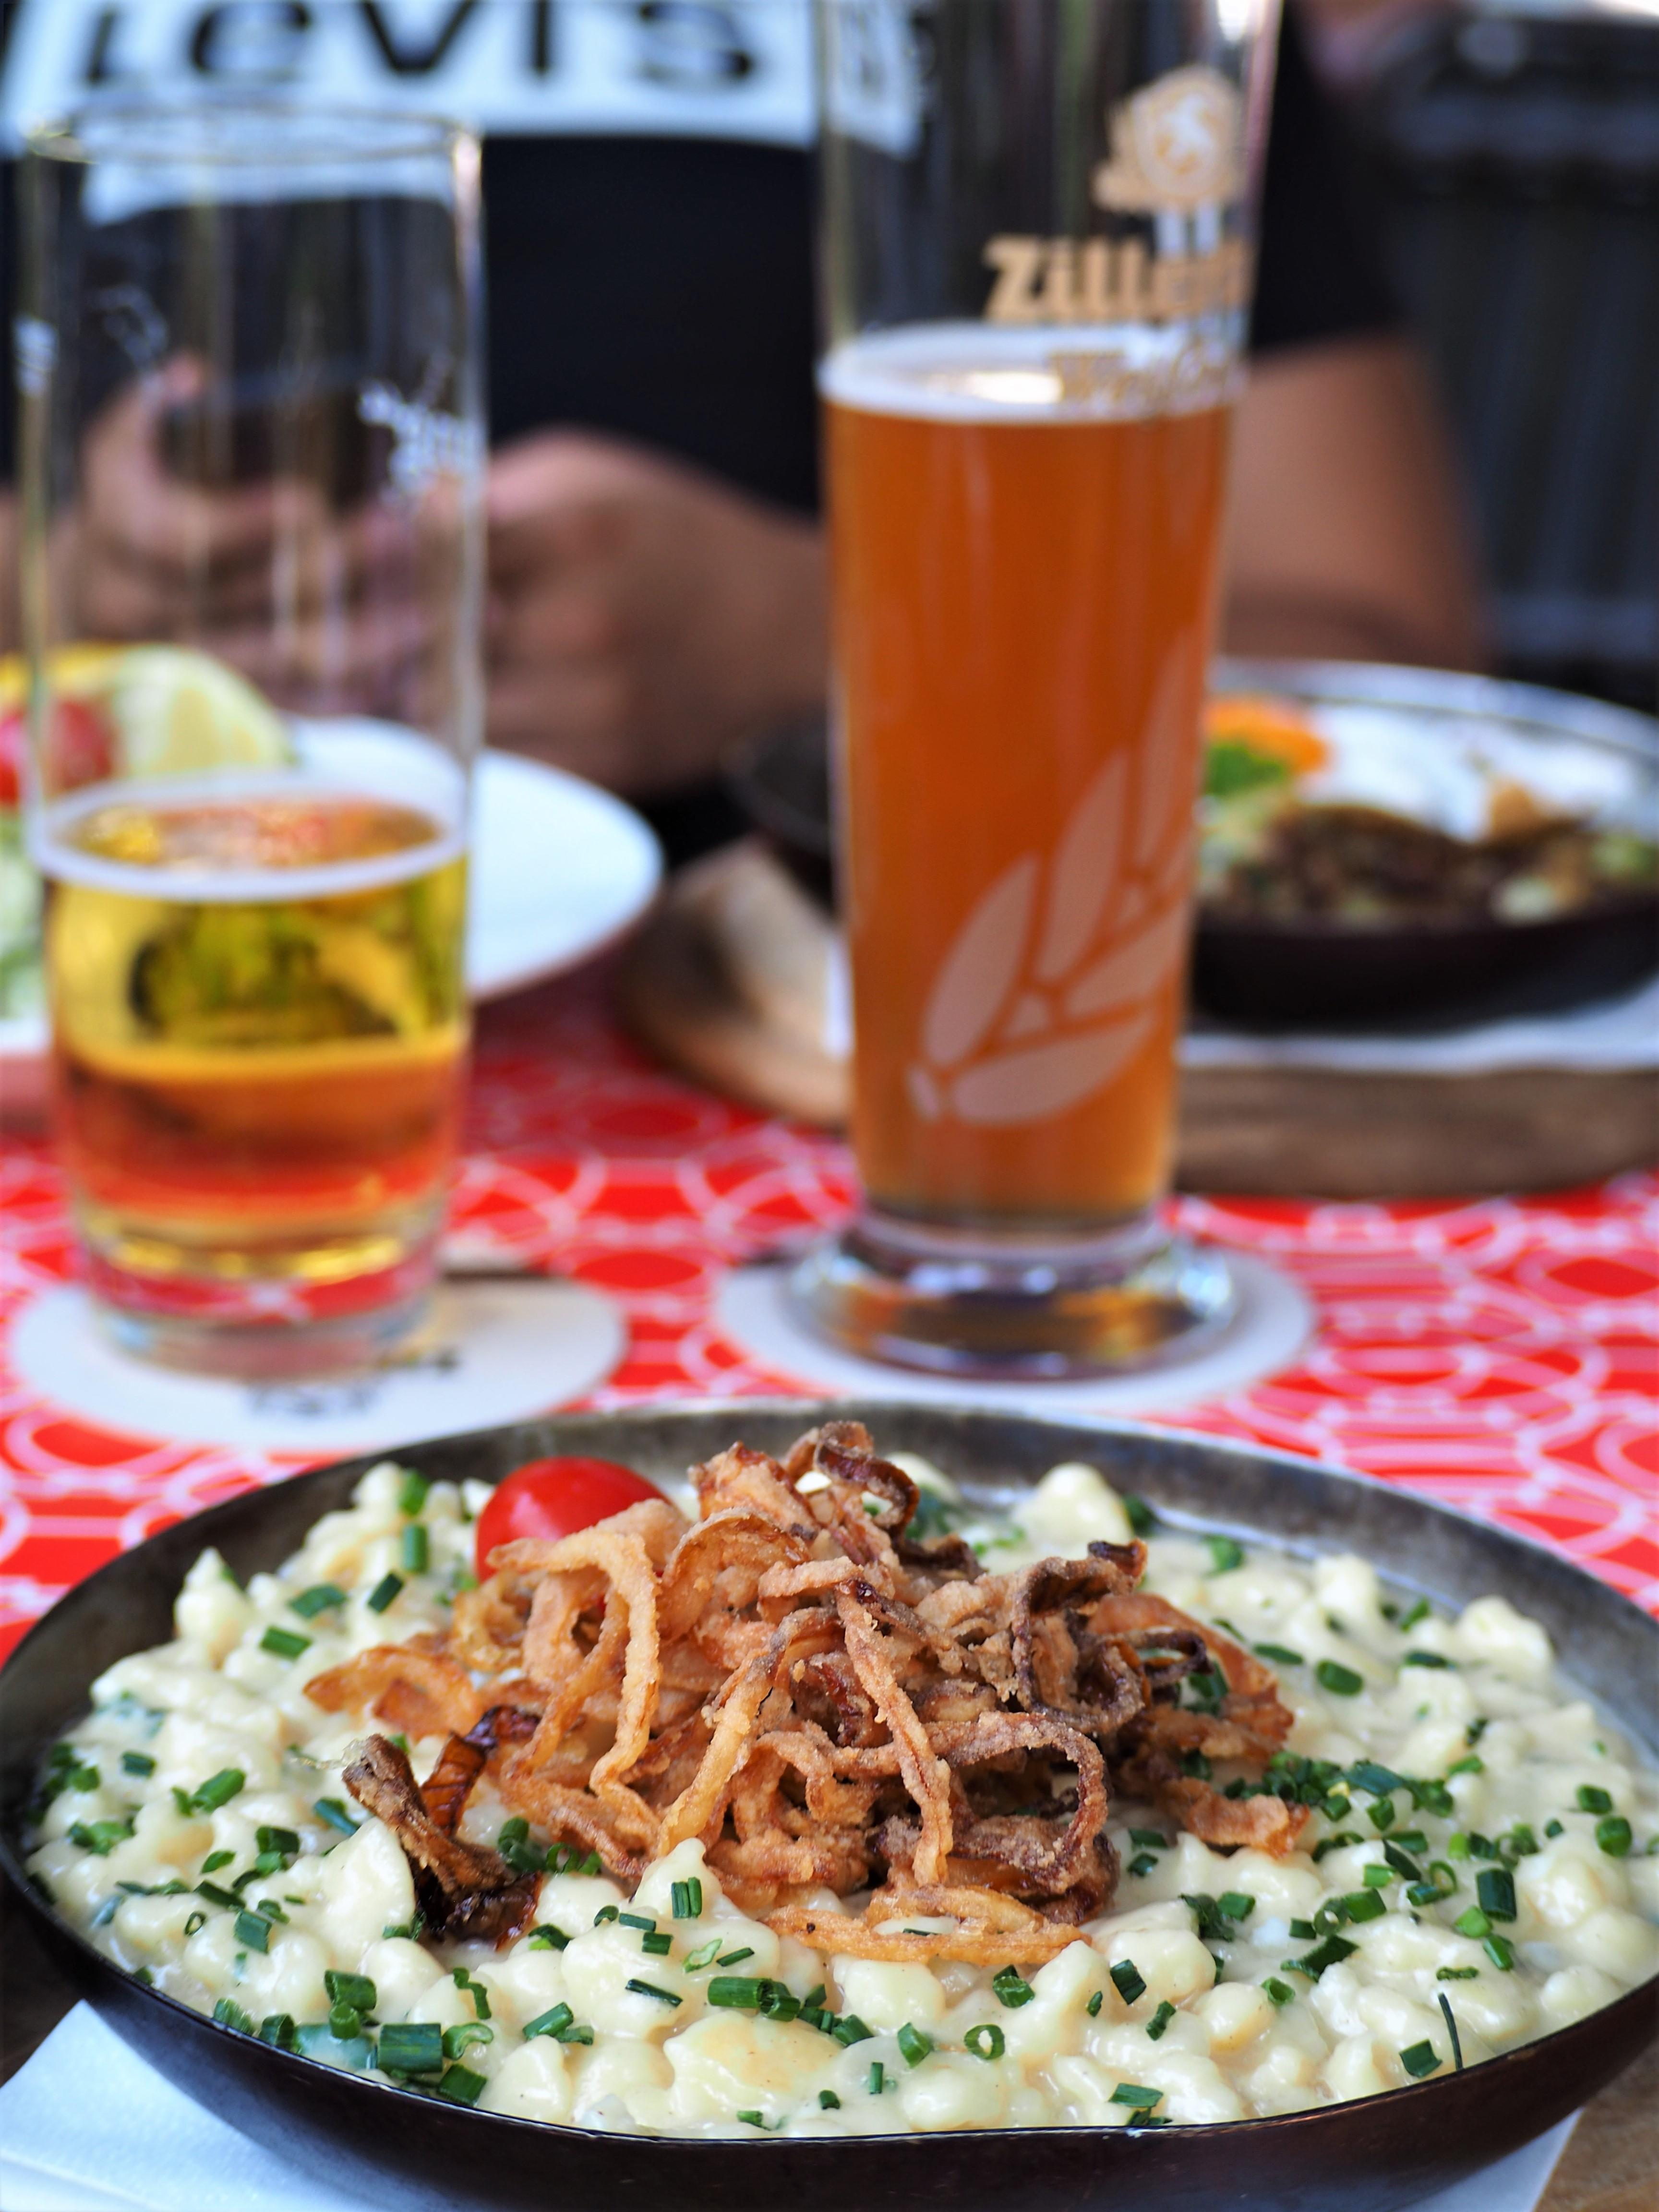 kasespatzle innsbruck spécialités autrichienne blog voyage